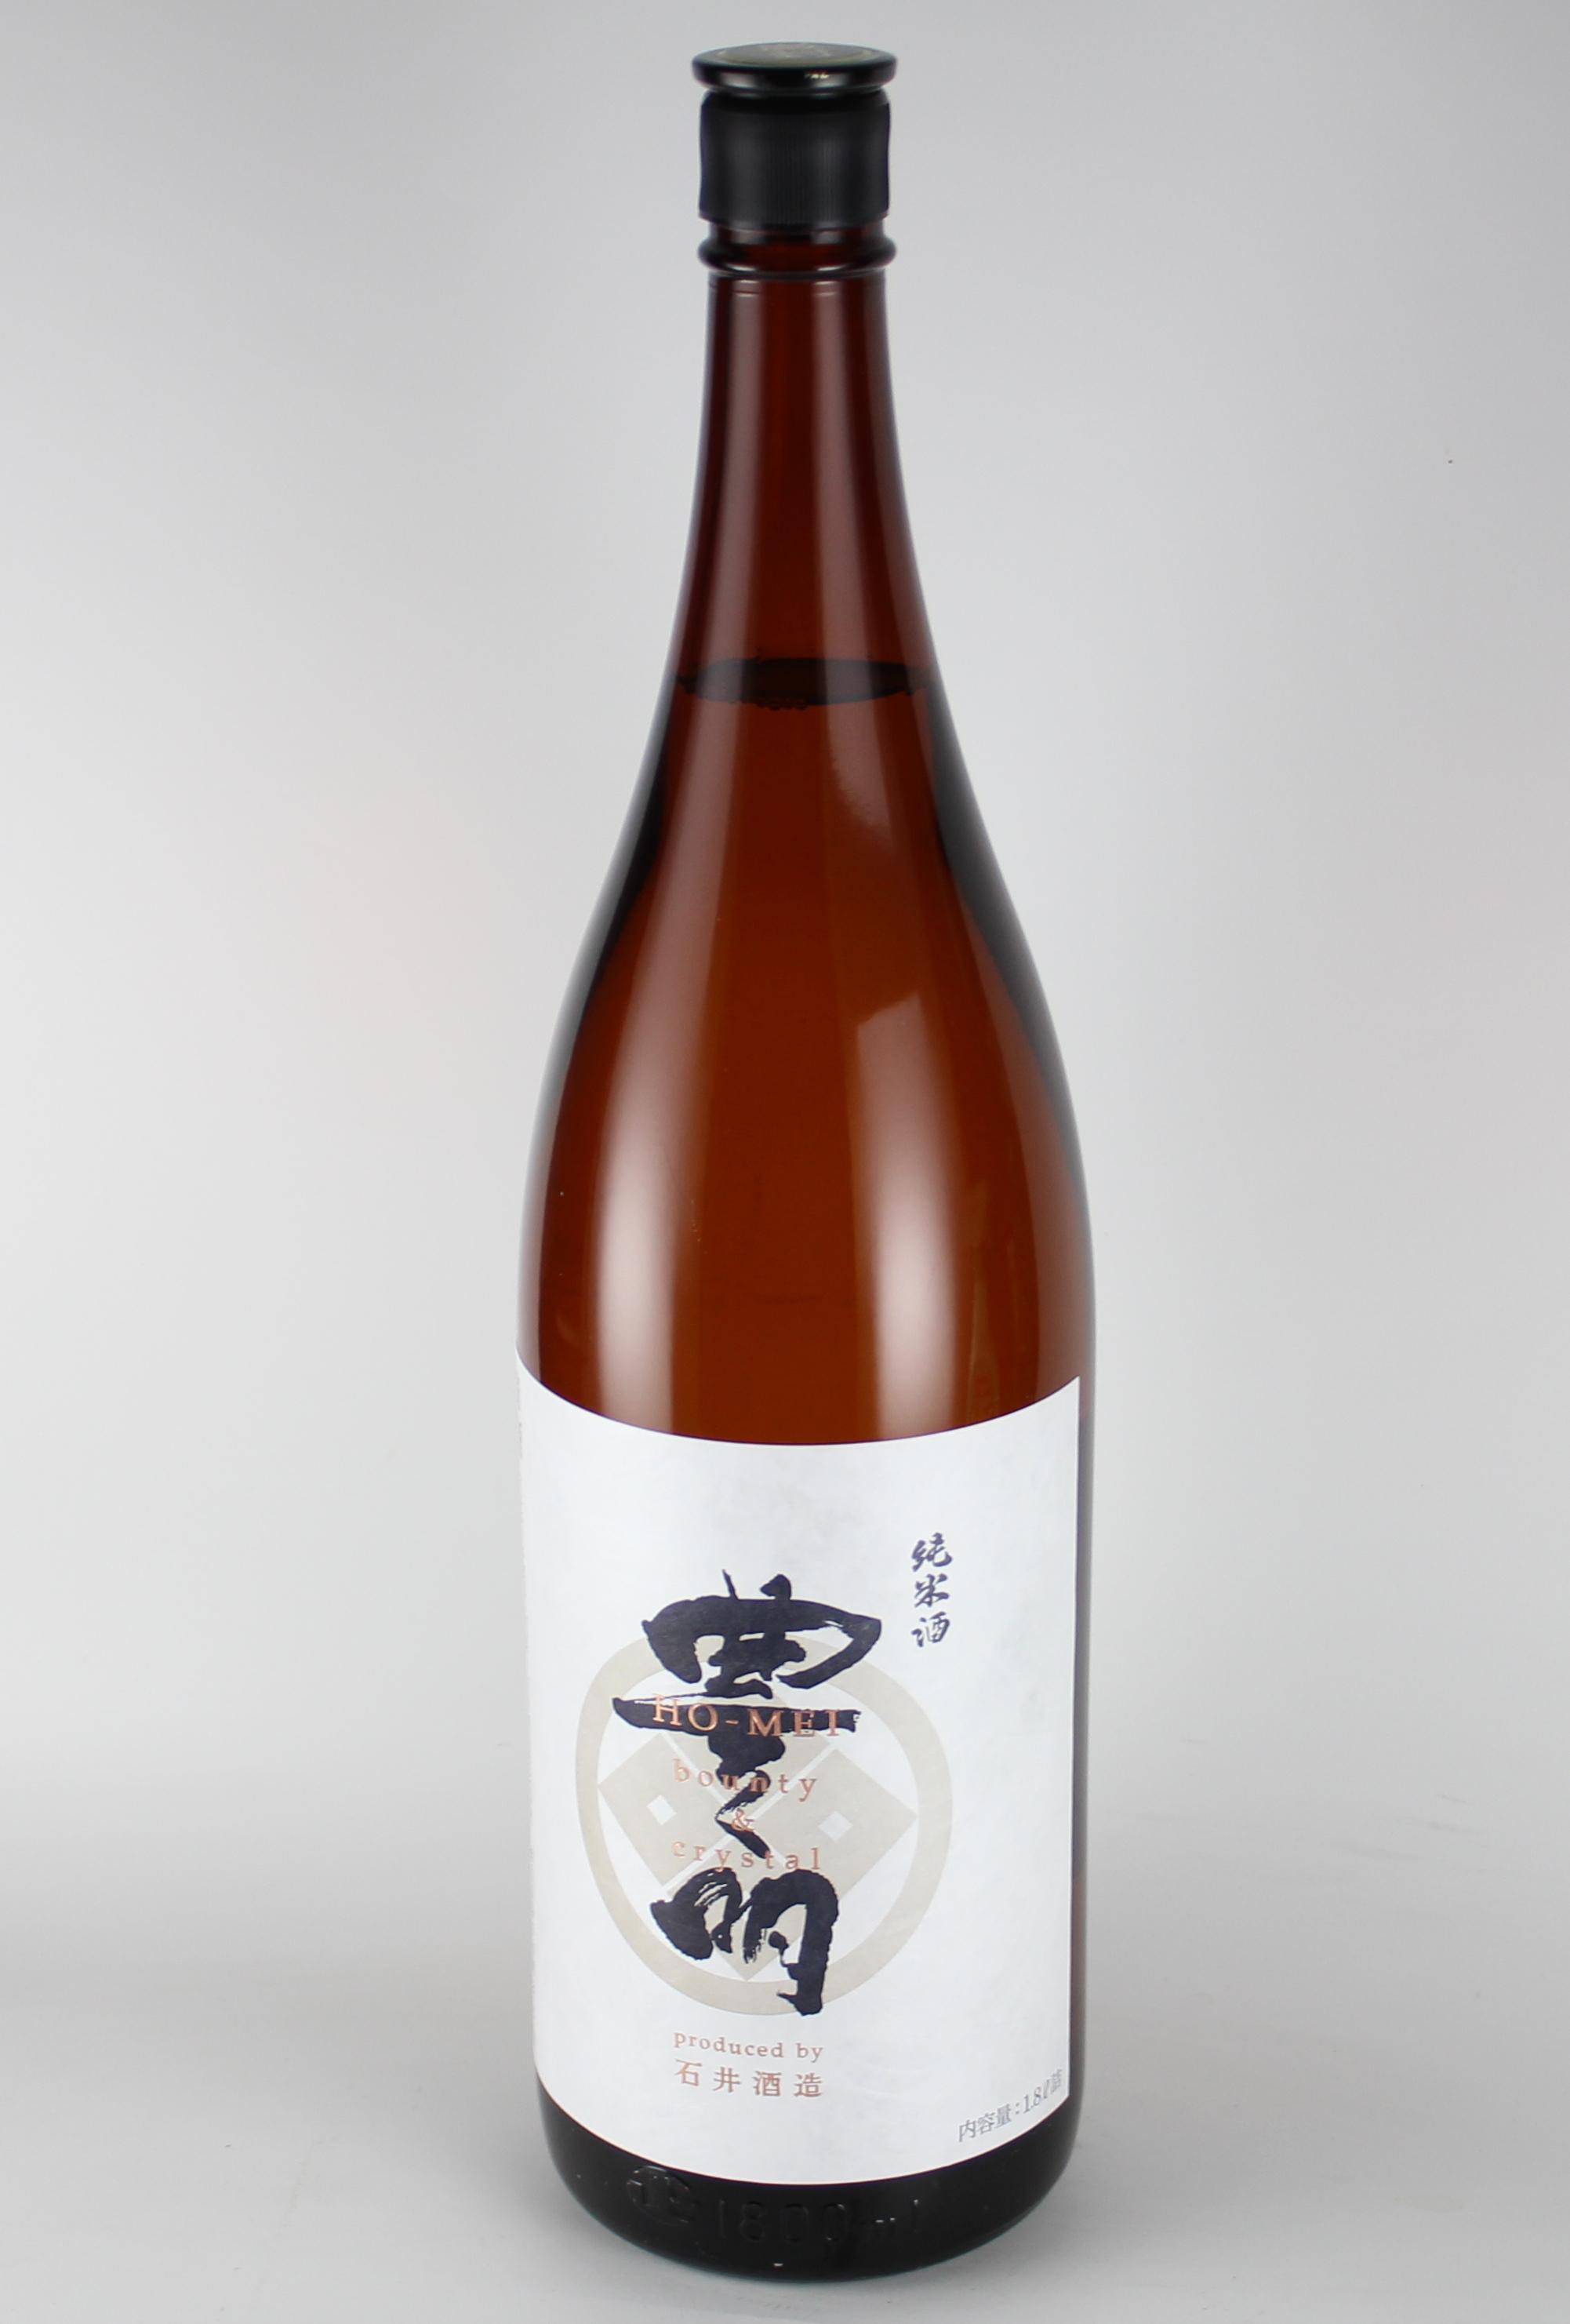 豊明 純米 さけ武蔵 1800ml 【埼玉/石井酒造】